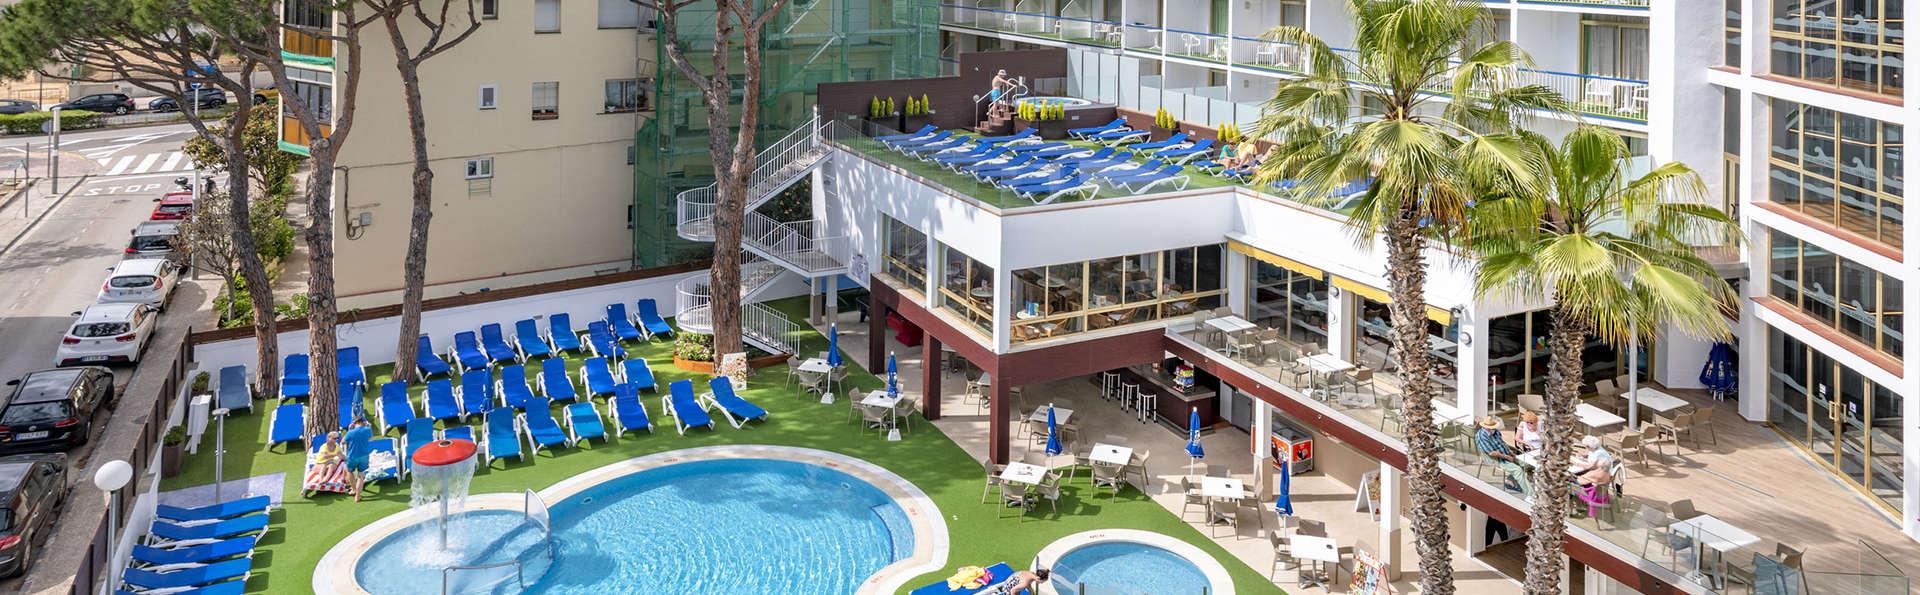 Hotel GHT Costa Brava & Spa - EDIT_FRONT.jpg